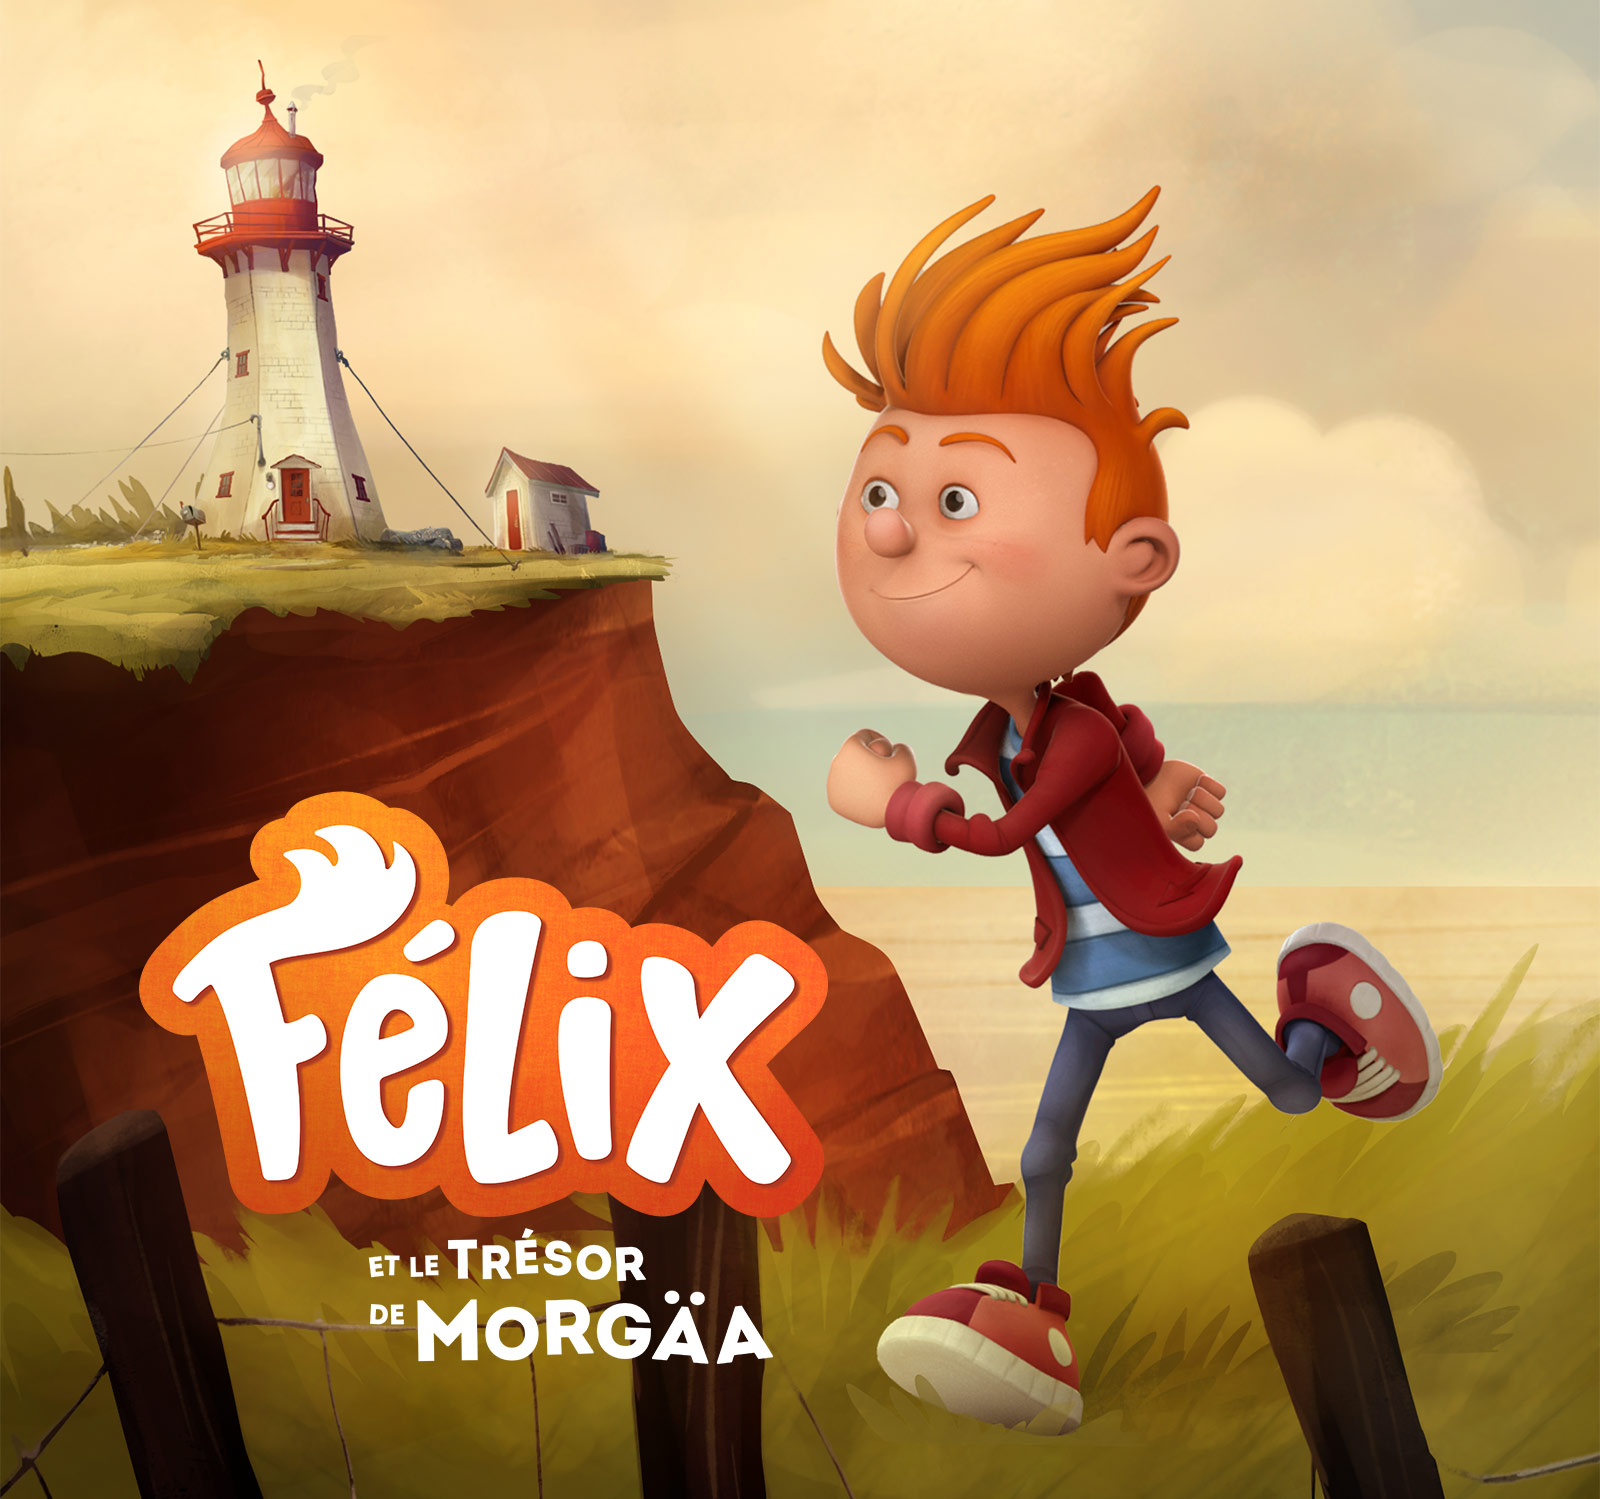 Felix et le tresor de Morgaa